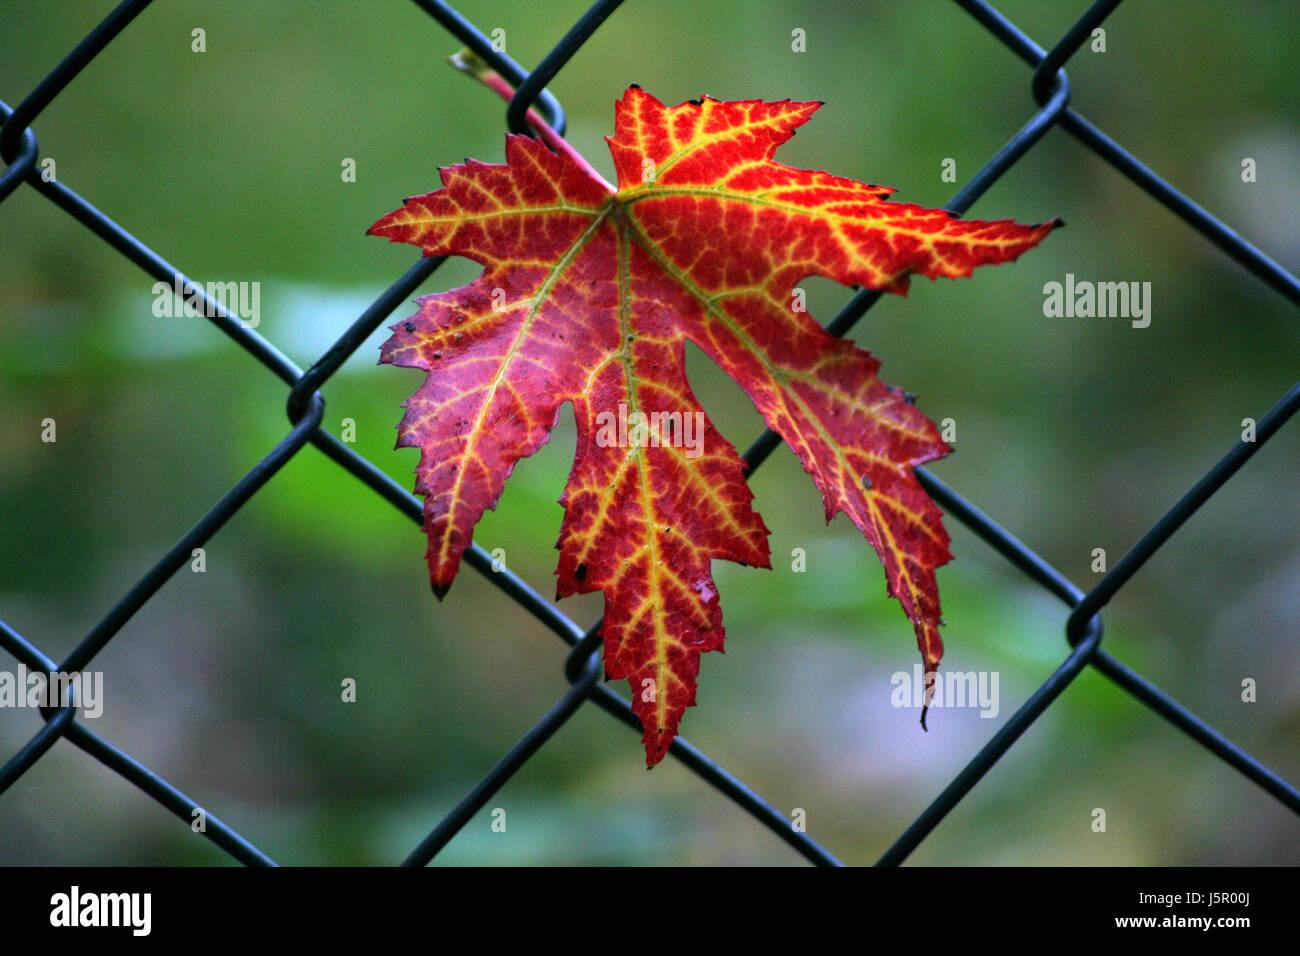 entanglement - Stock Image